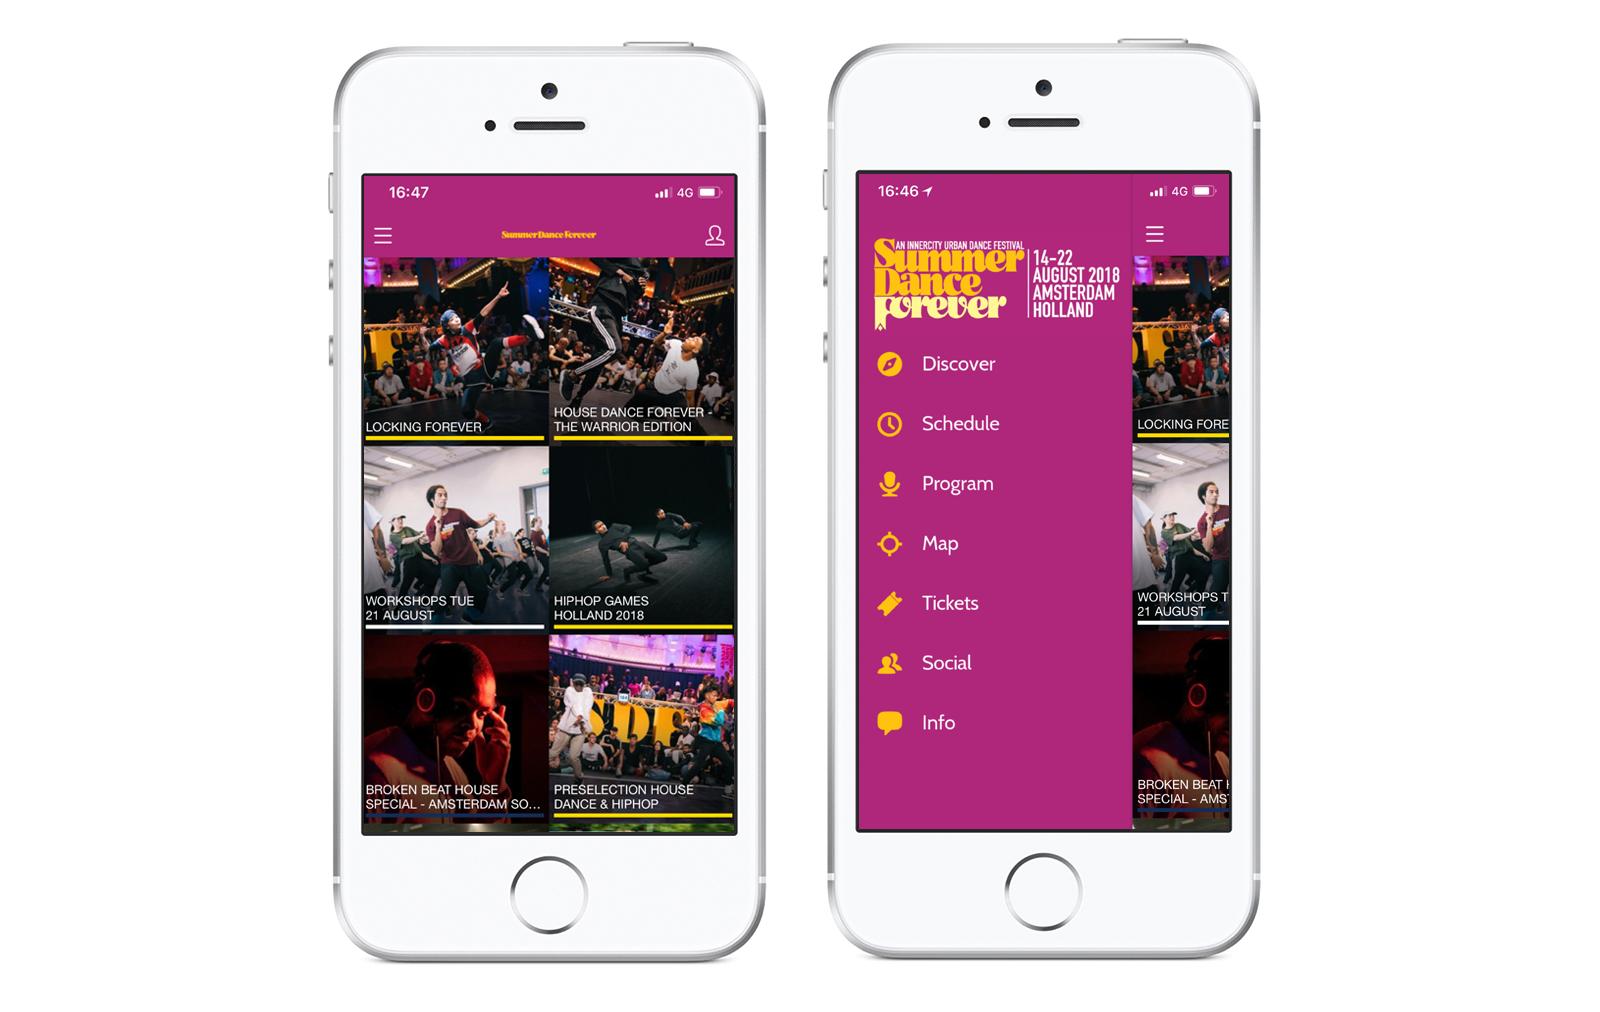 Download the Summer Dance Forever 2018 app